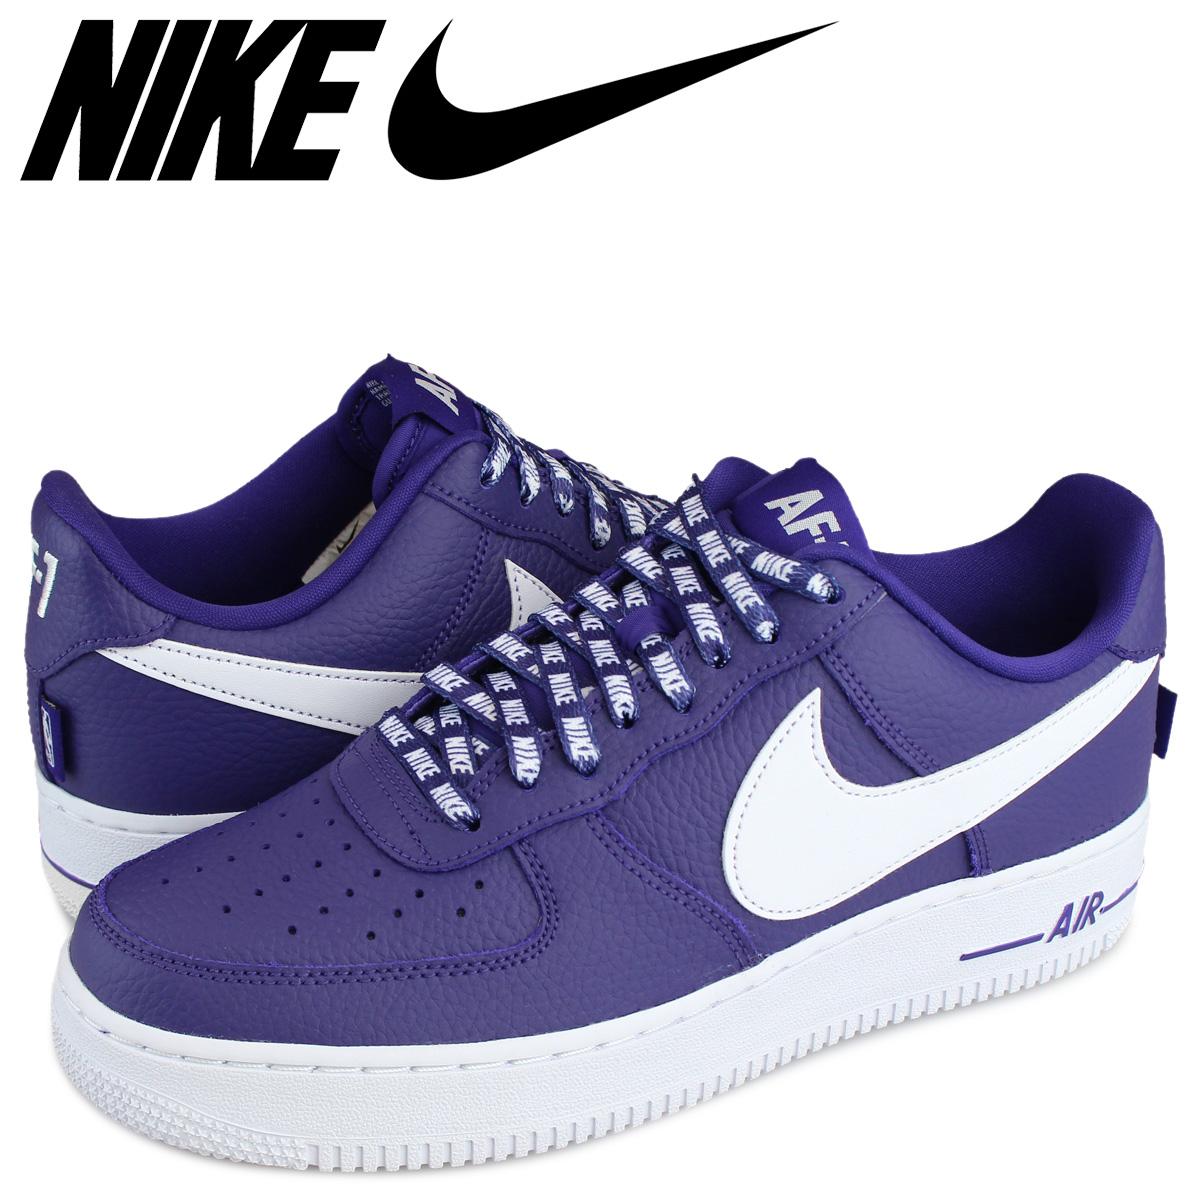 Buy nike air force 1 07 mens purple